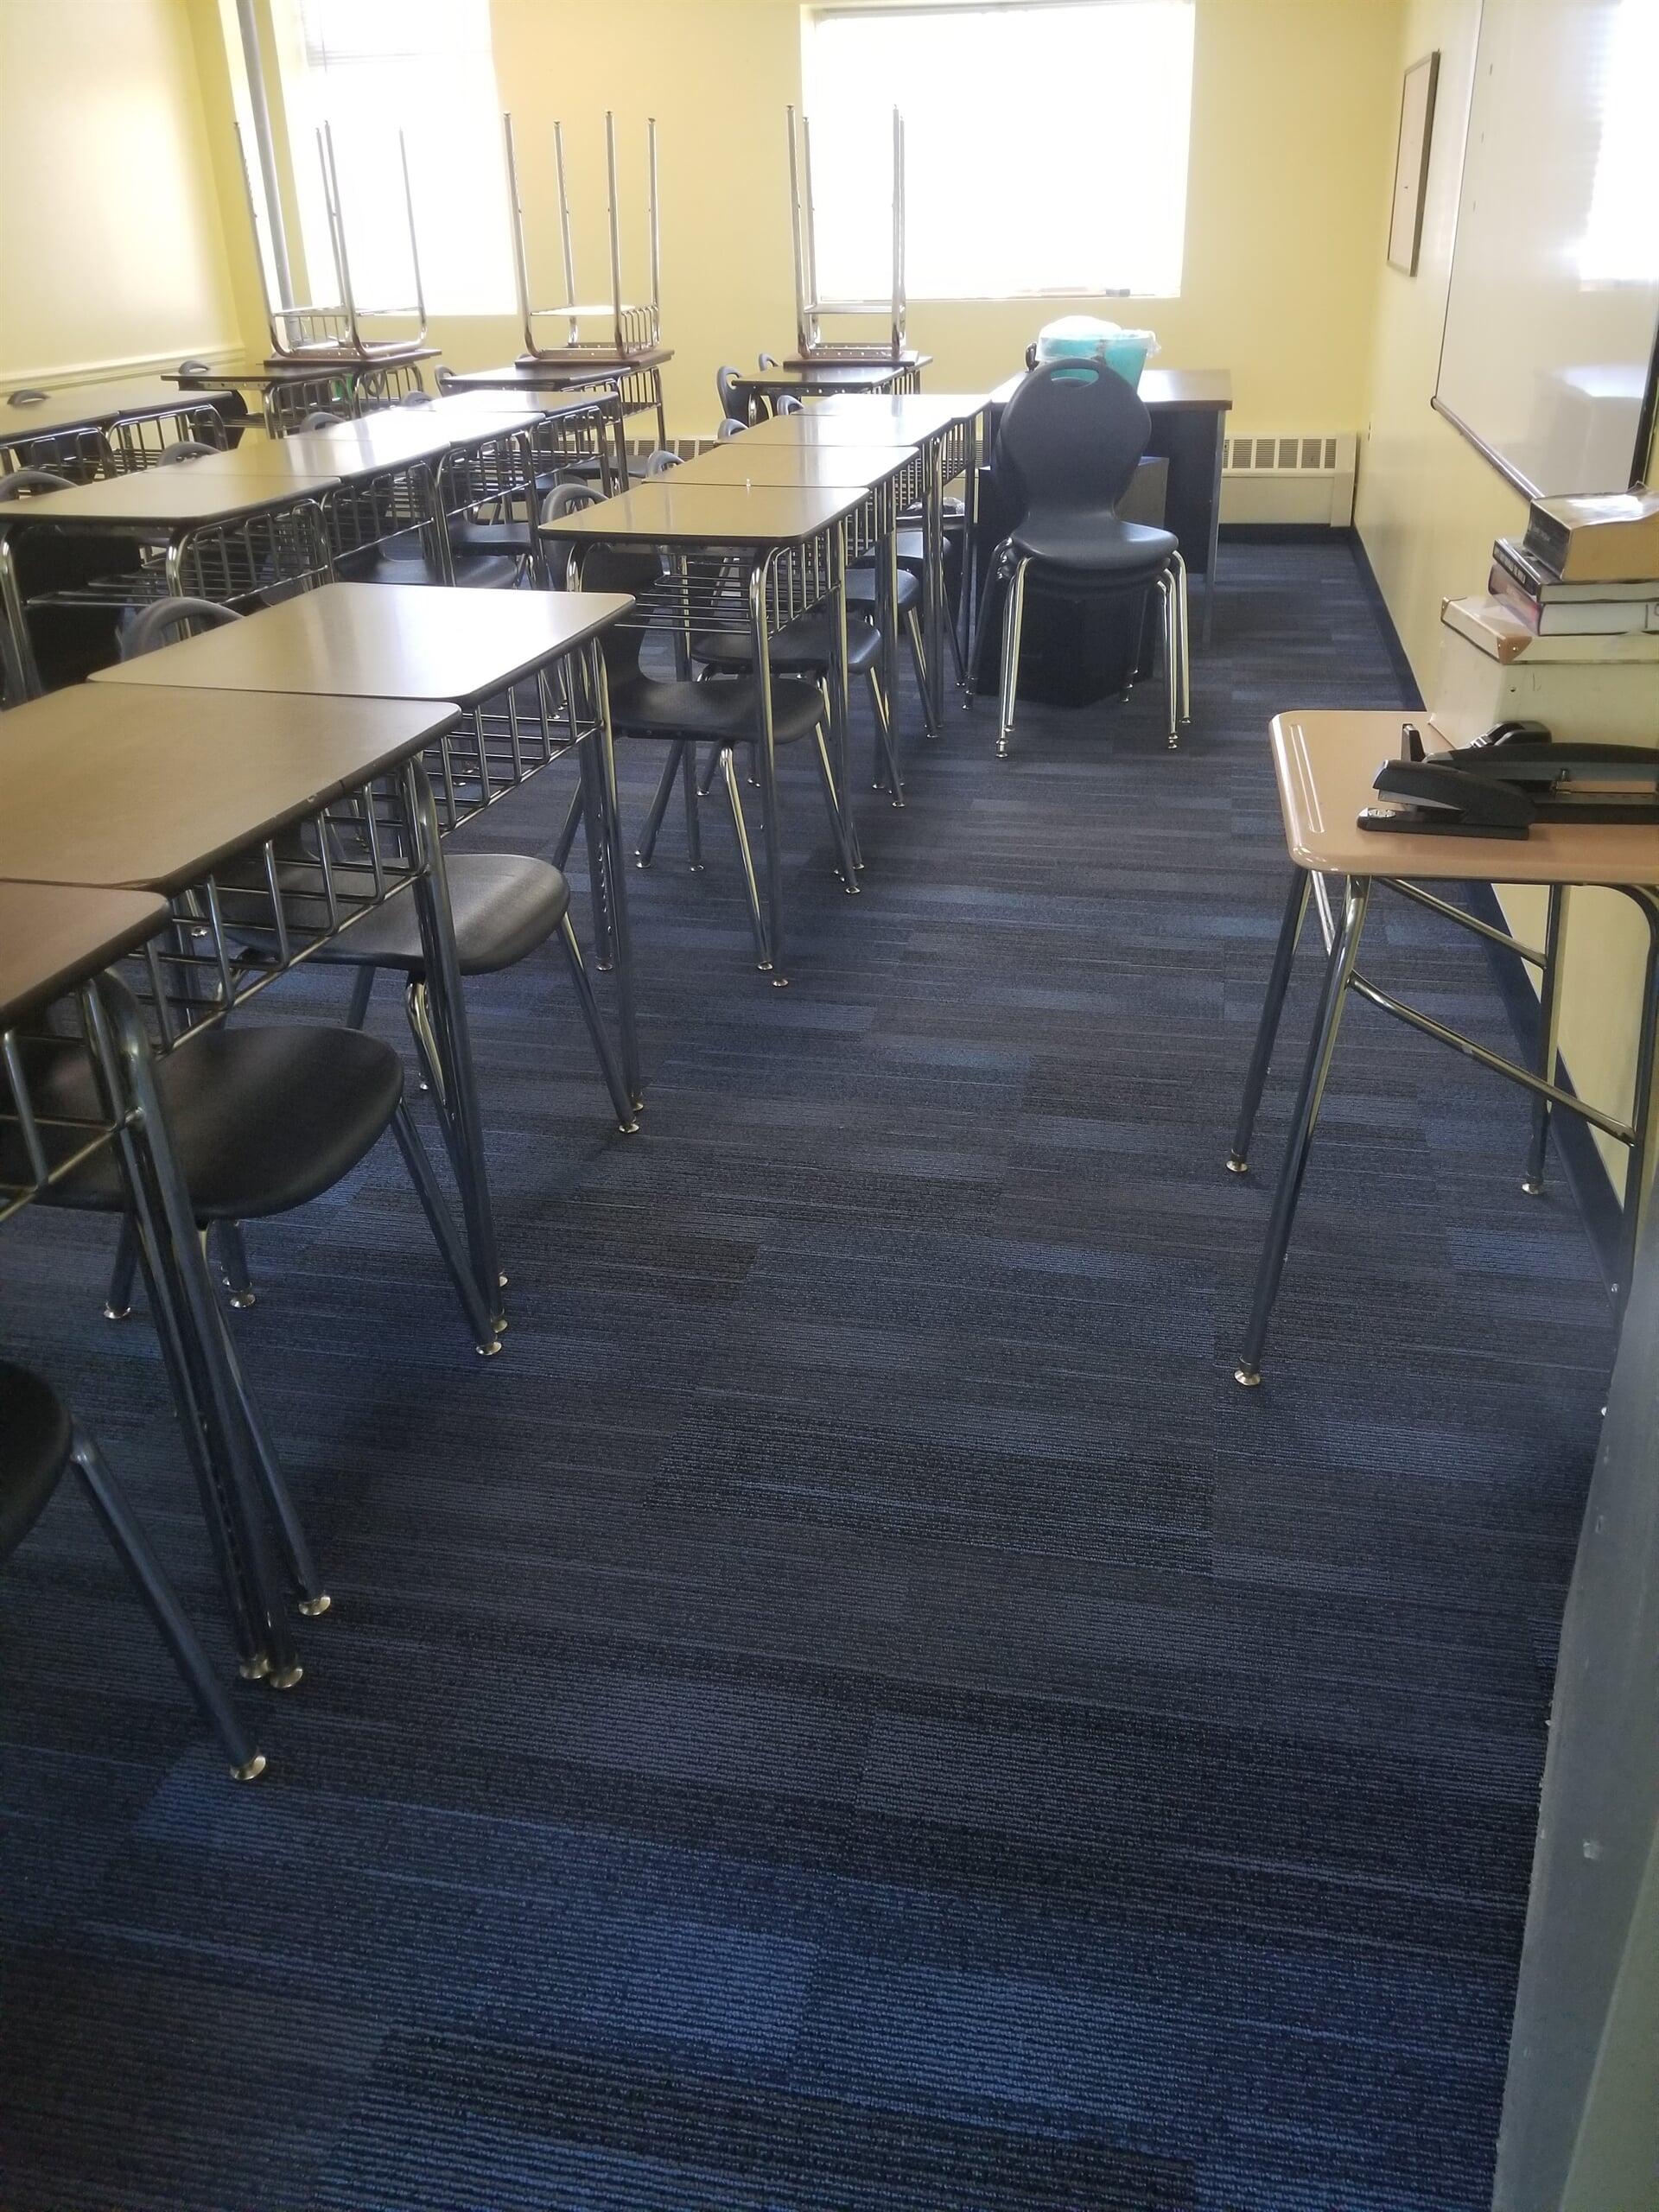 Commercial carpet in Poplar, PA from Philadelphia Flooring Solutions